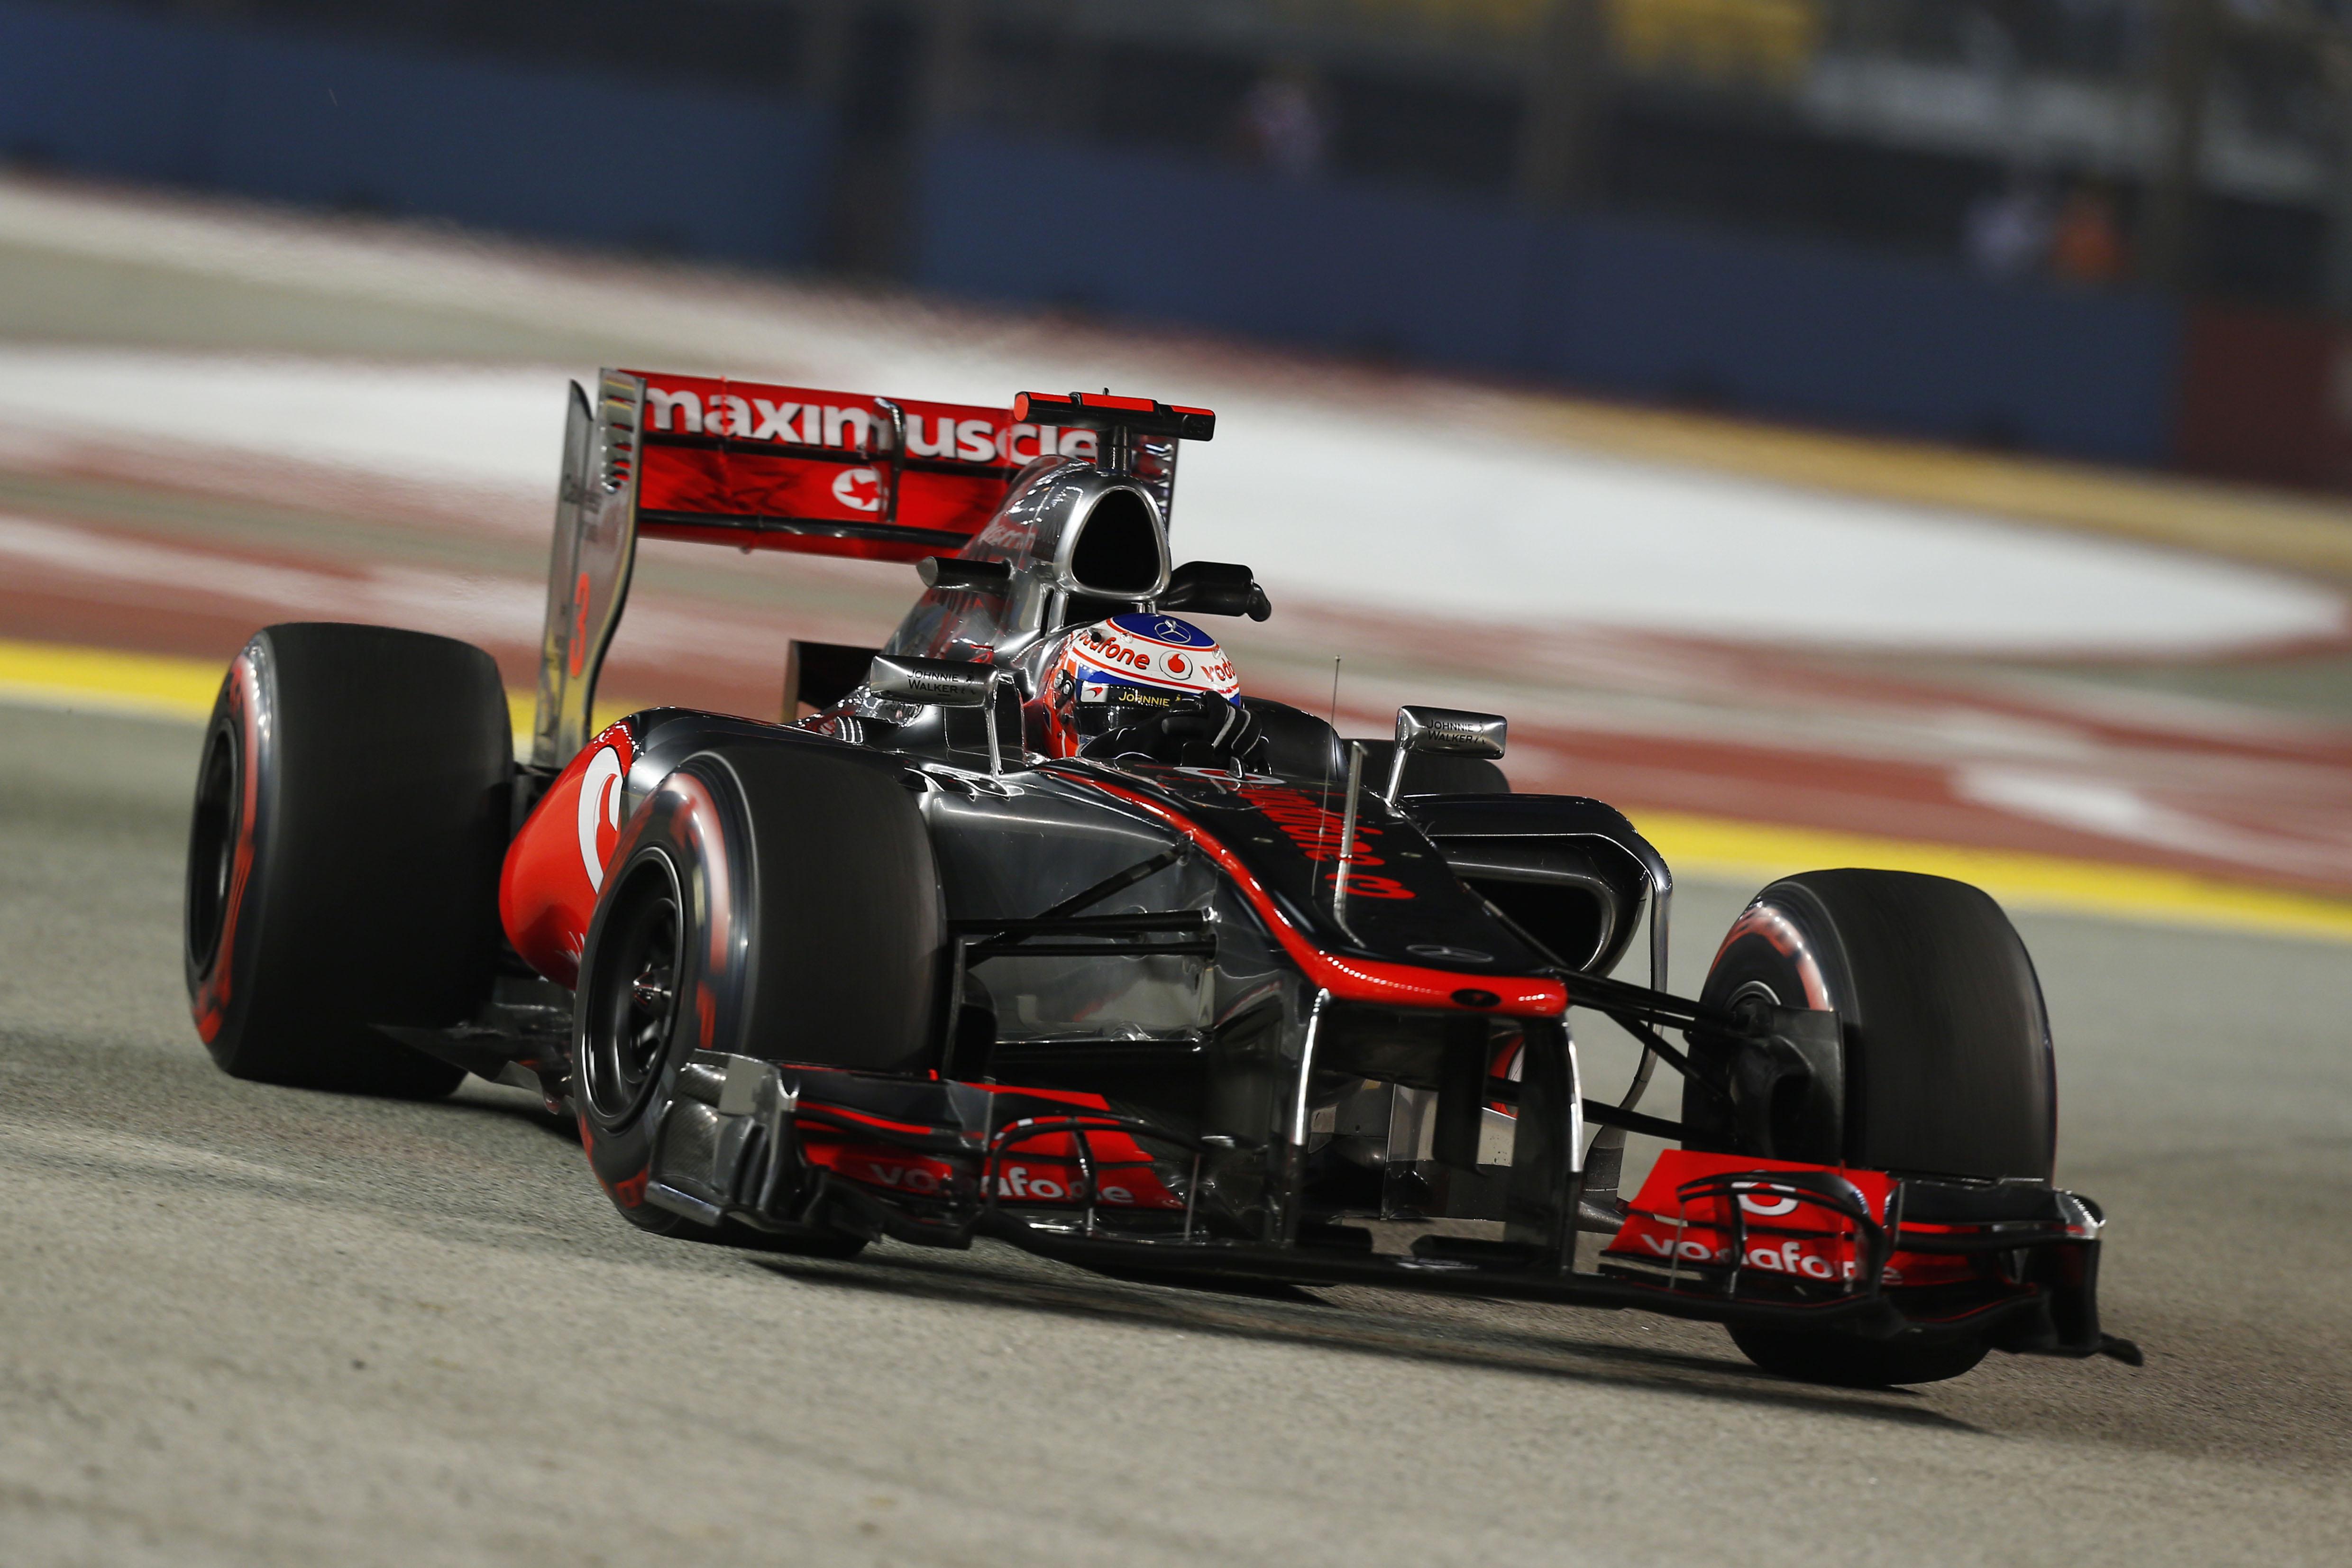 F1 2012 Singapore Grand Prix Results Vodafone Mclaren